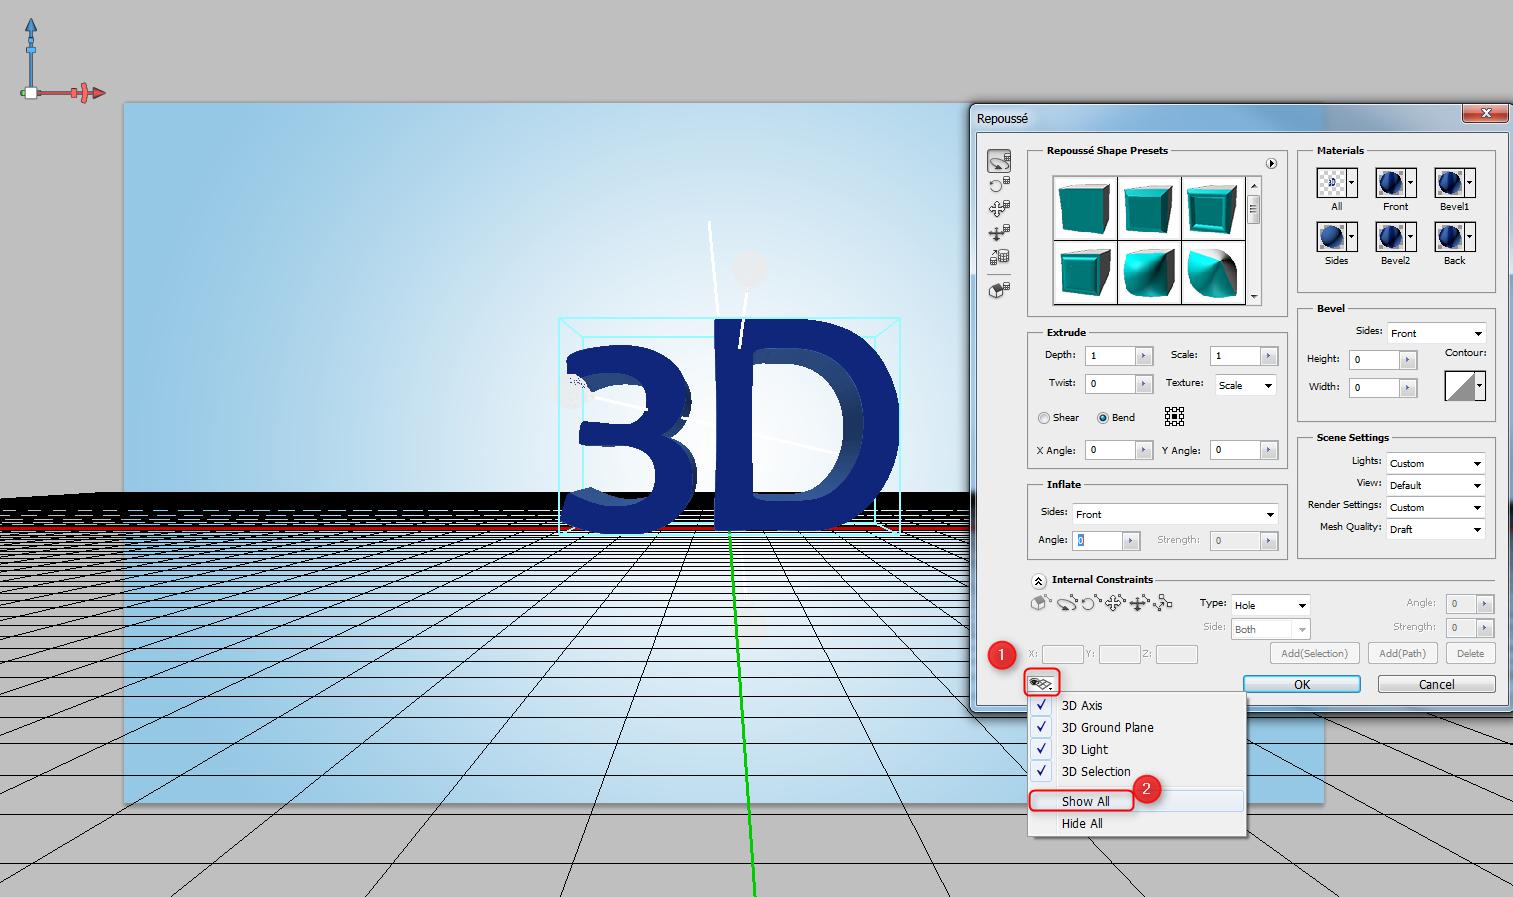 3D Light & 3D Selection